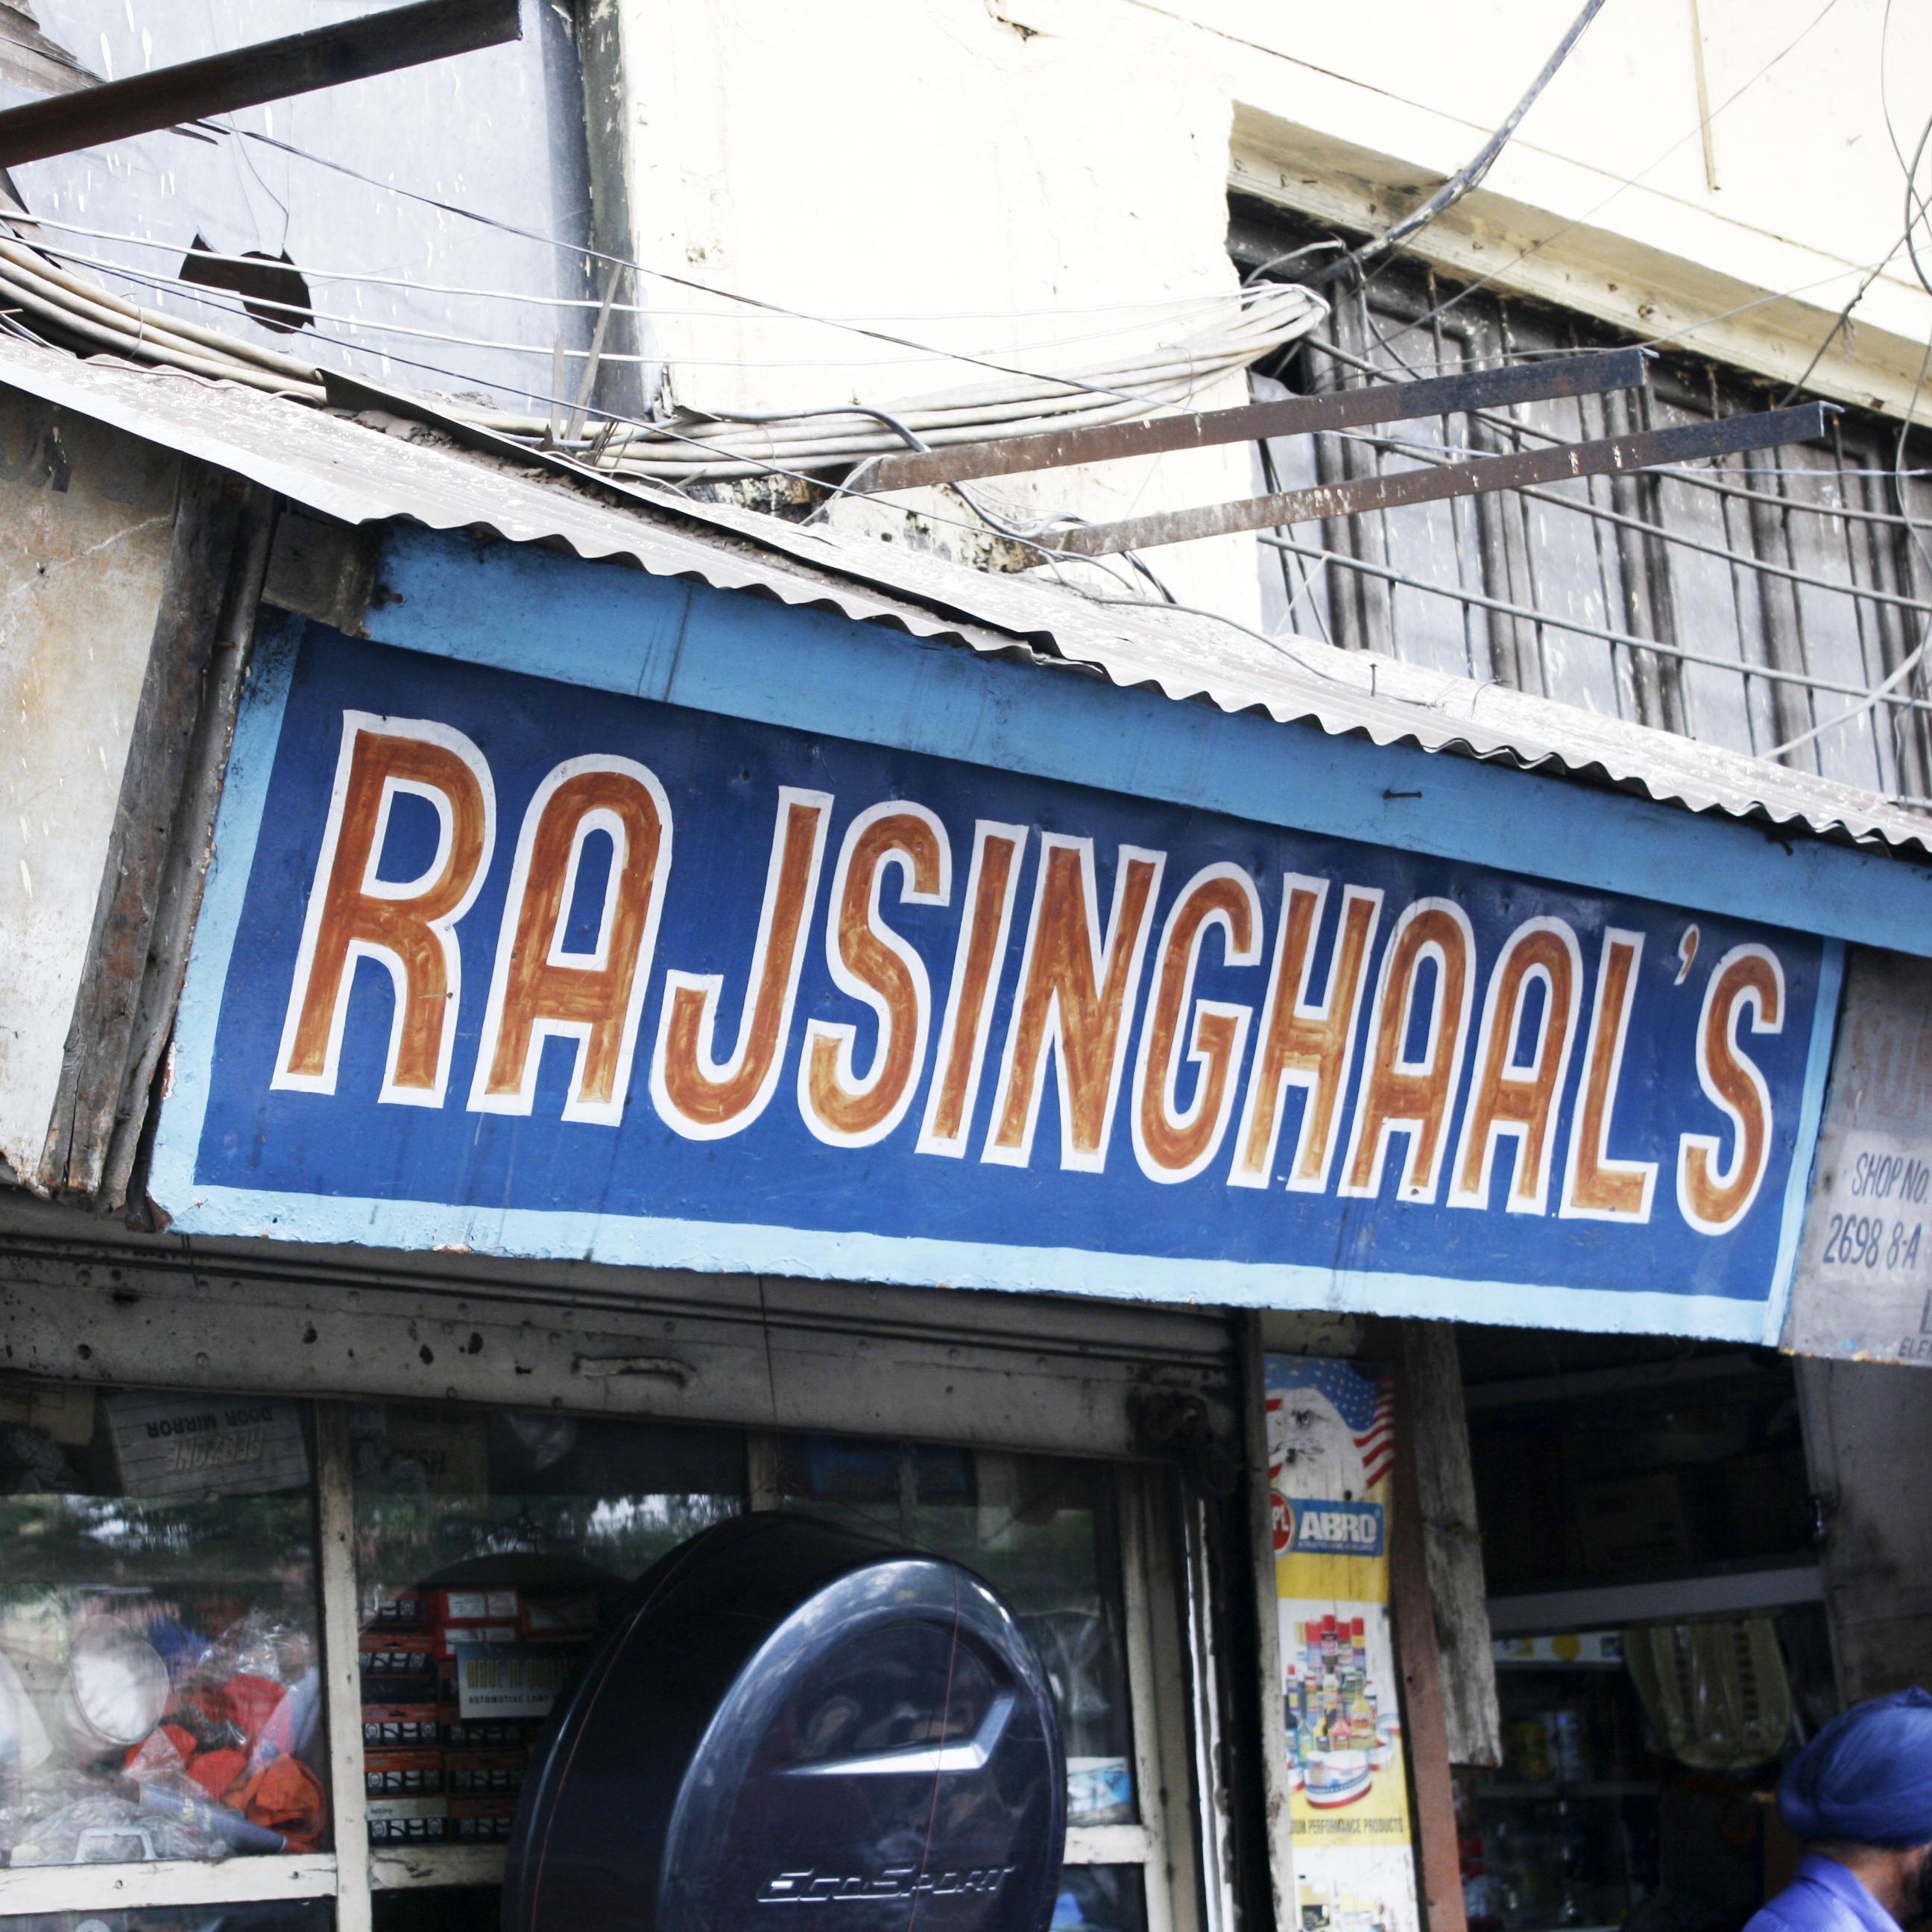 Raajsinghal's Auto Exchange